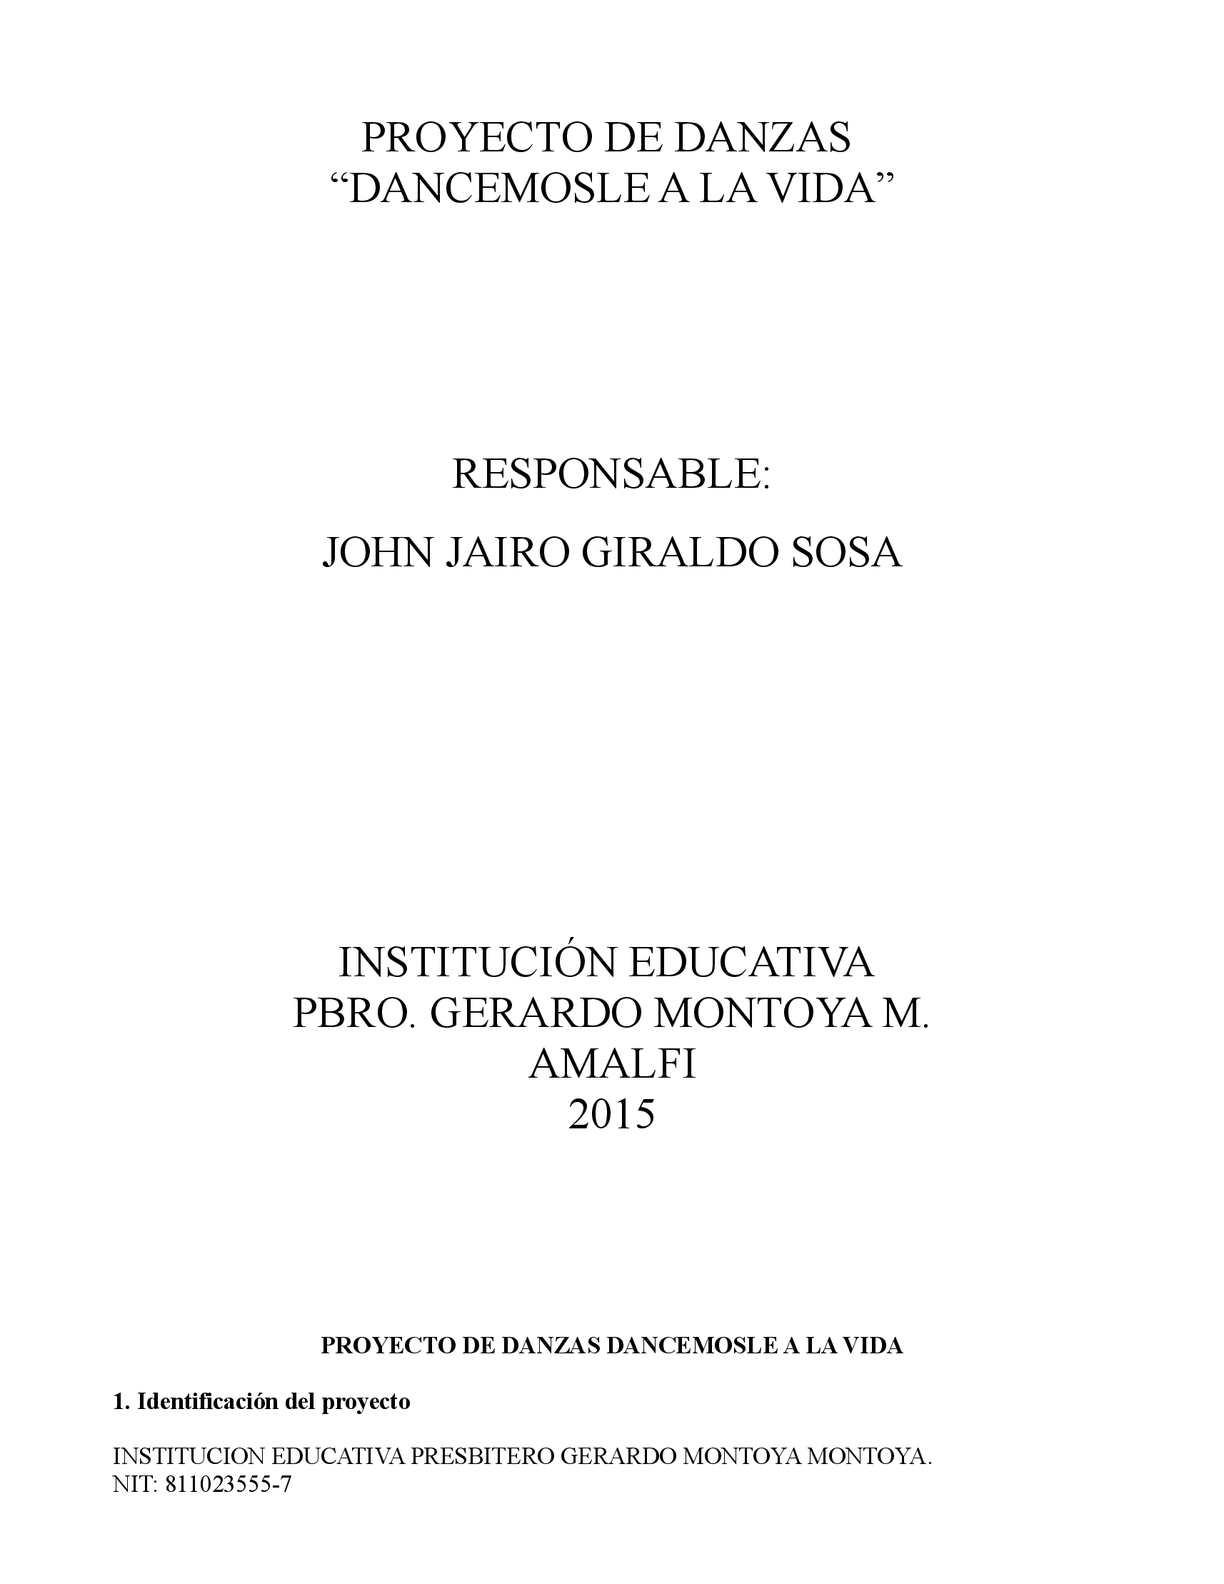 Proyecto De Danzas Institucion Educativa Presbitero Gerardo Montoya M 2